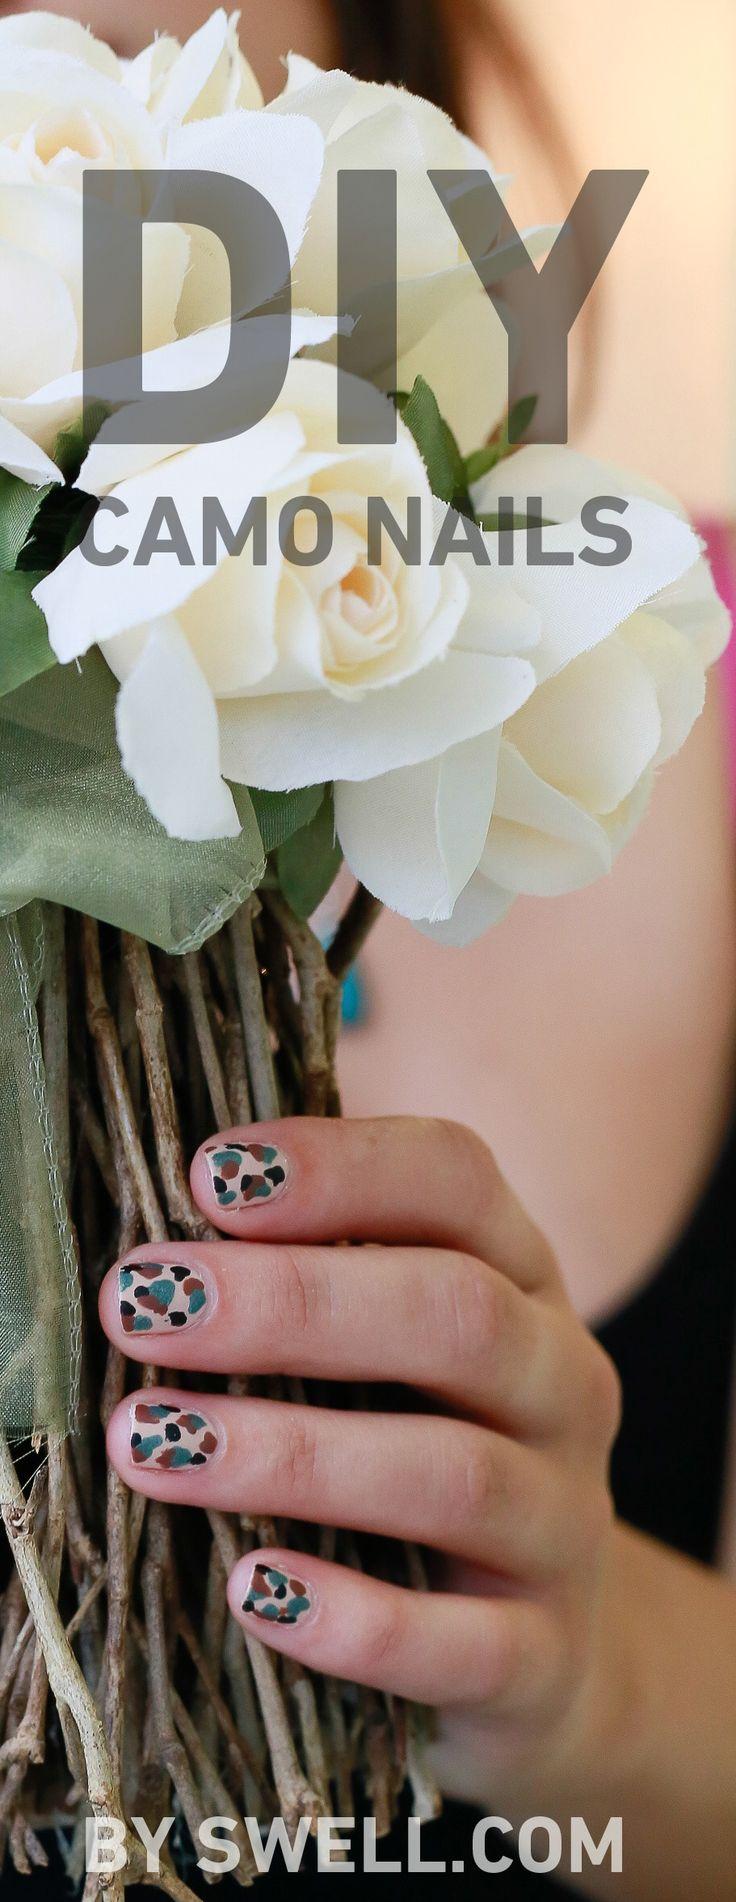 8 best Cosas que adoro images on Pinterest | Drag queens, Adore ...